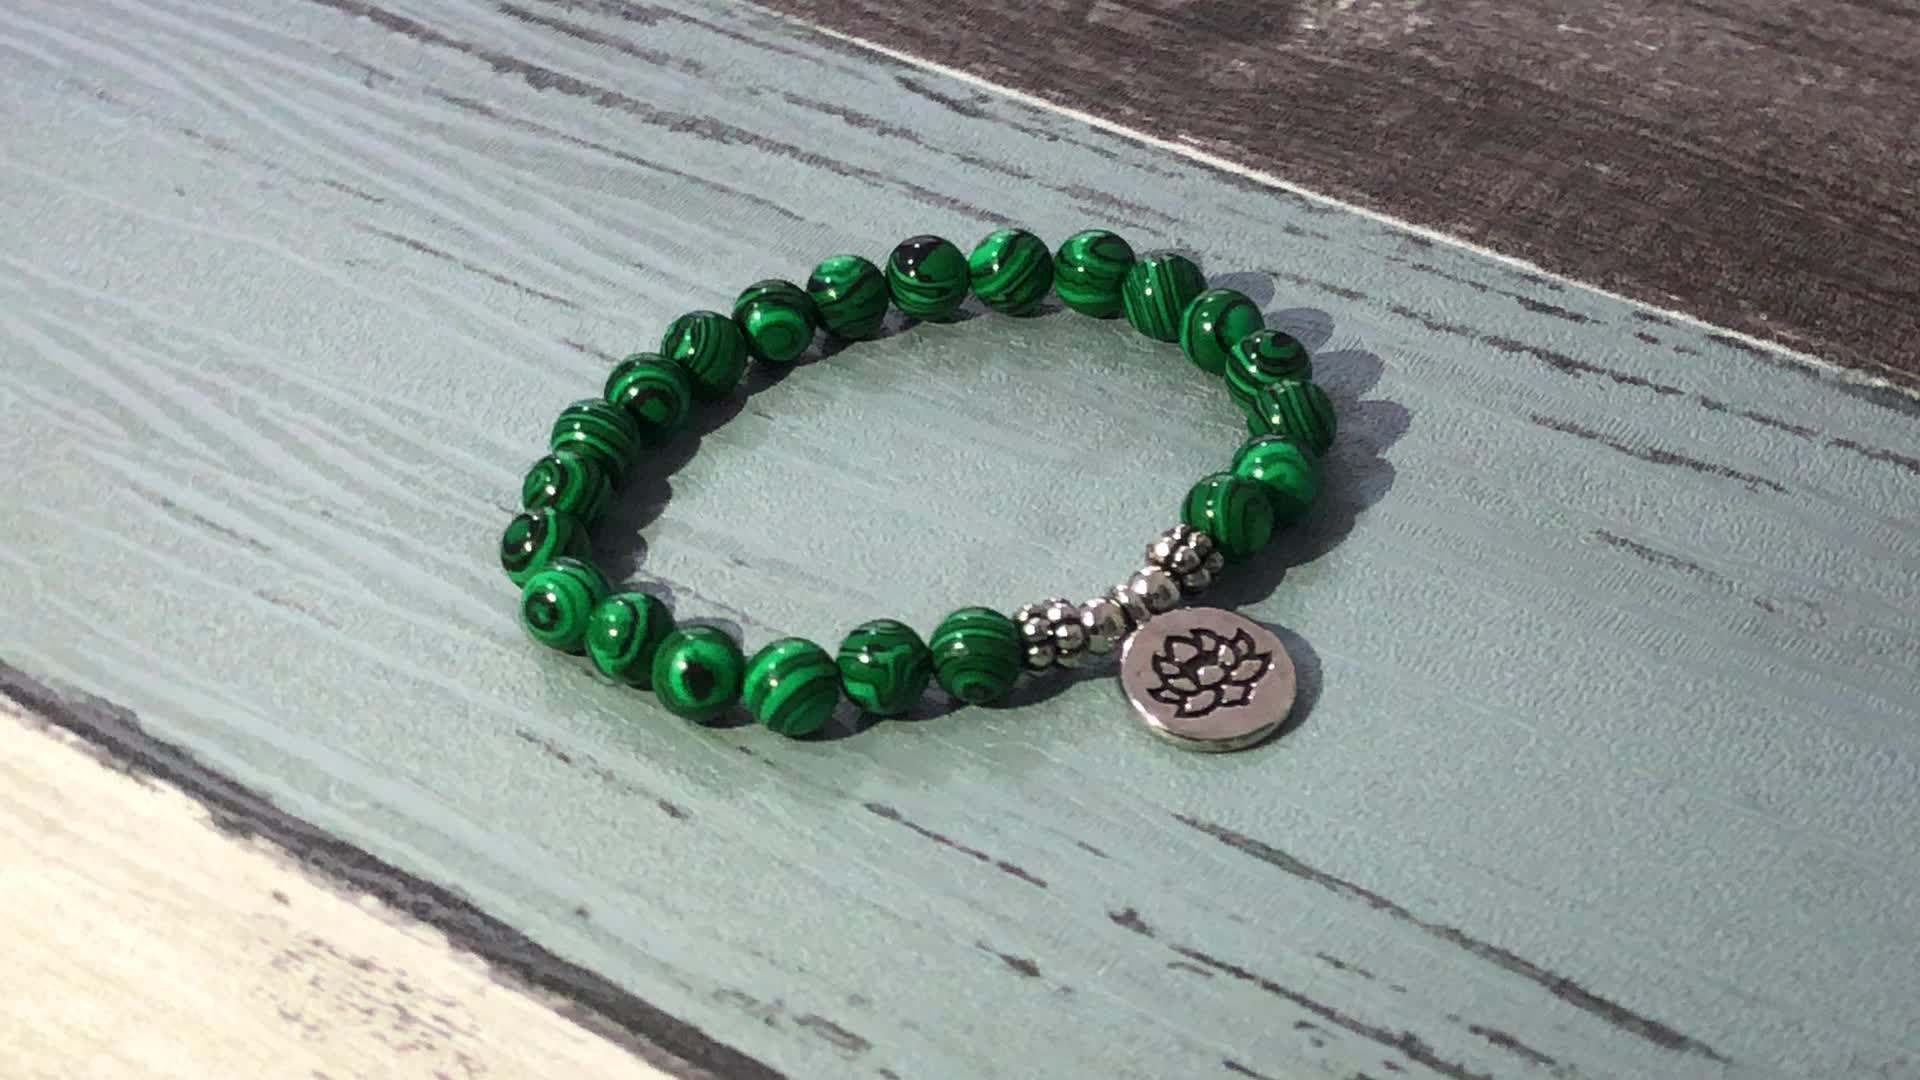 SN1538 Newest Women Healing Meditation Boho Wrist Mala Lotus Jewelry 8mm Pink Moonstone OM Bracelet for Ladies